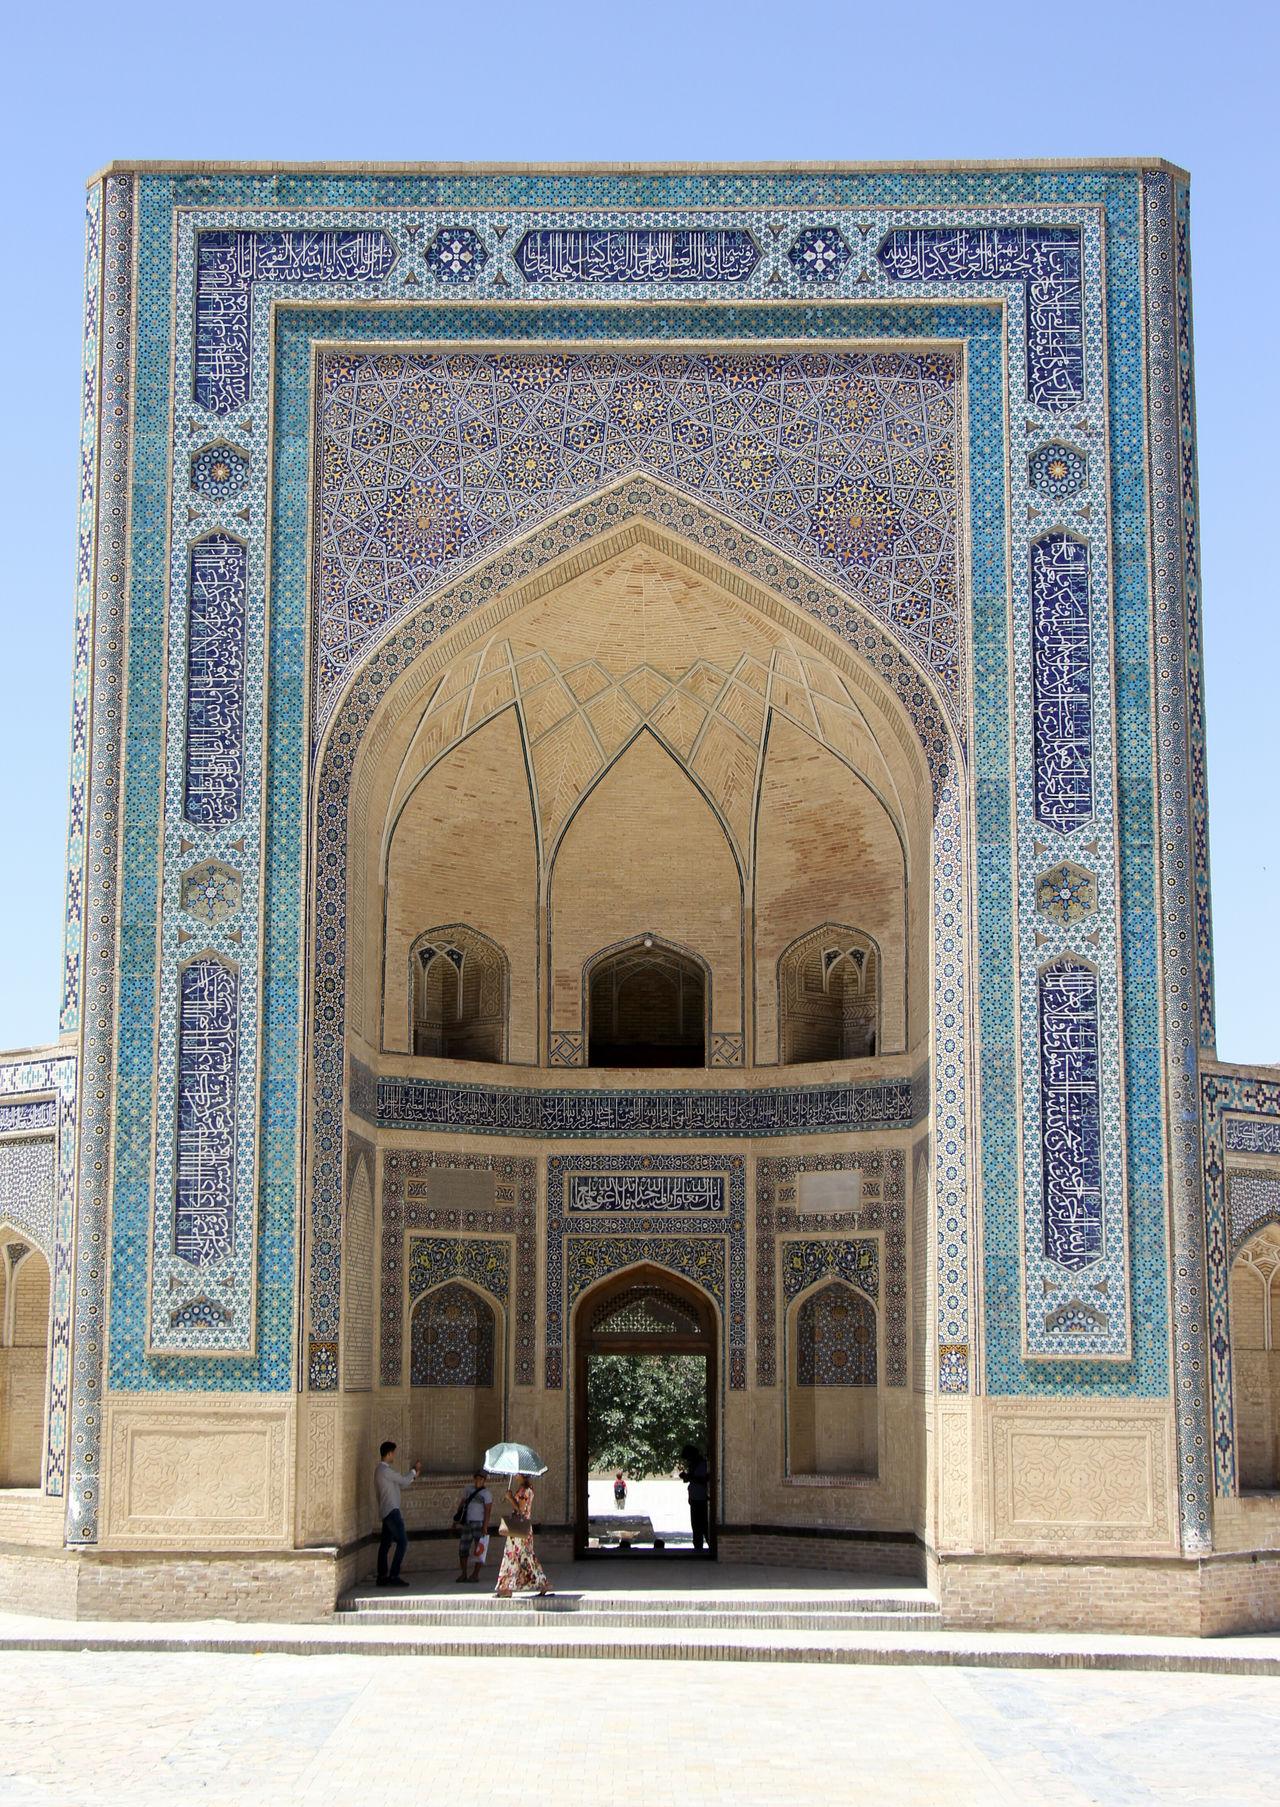 Adult Arch Architecture Built Structure Bukhara Day Islamic Islamic Architecture Islamic Art Madrassa Only Men Outdoors People Silk Road Sitting Travel Destinations Uzbekistan